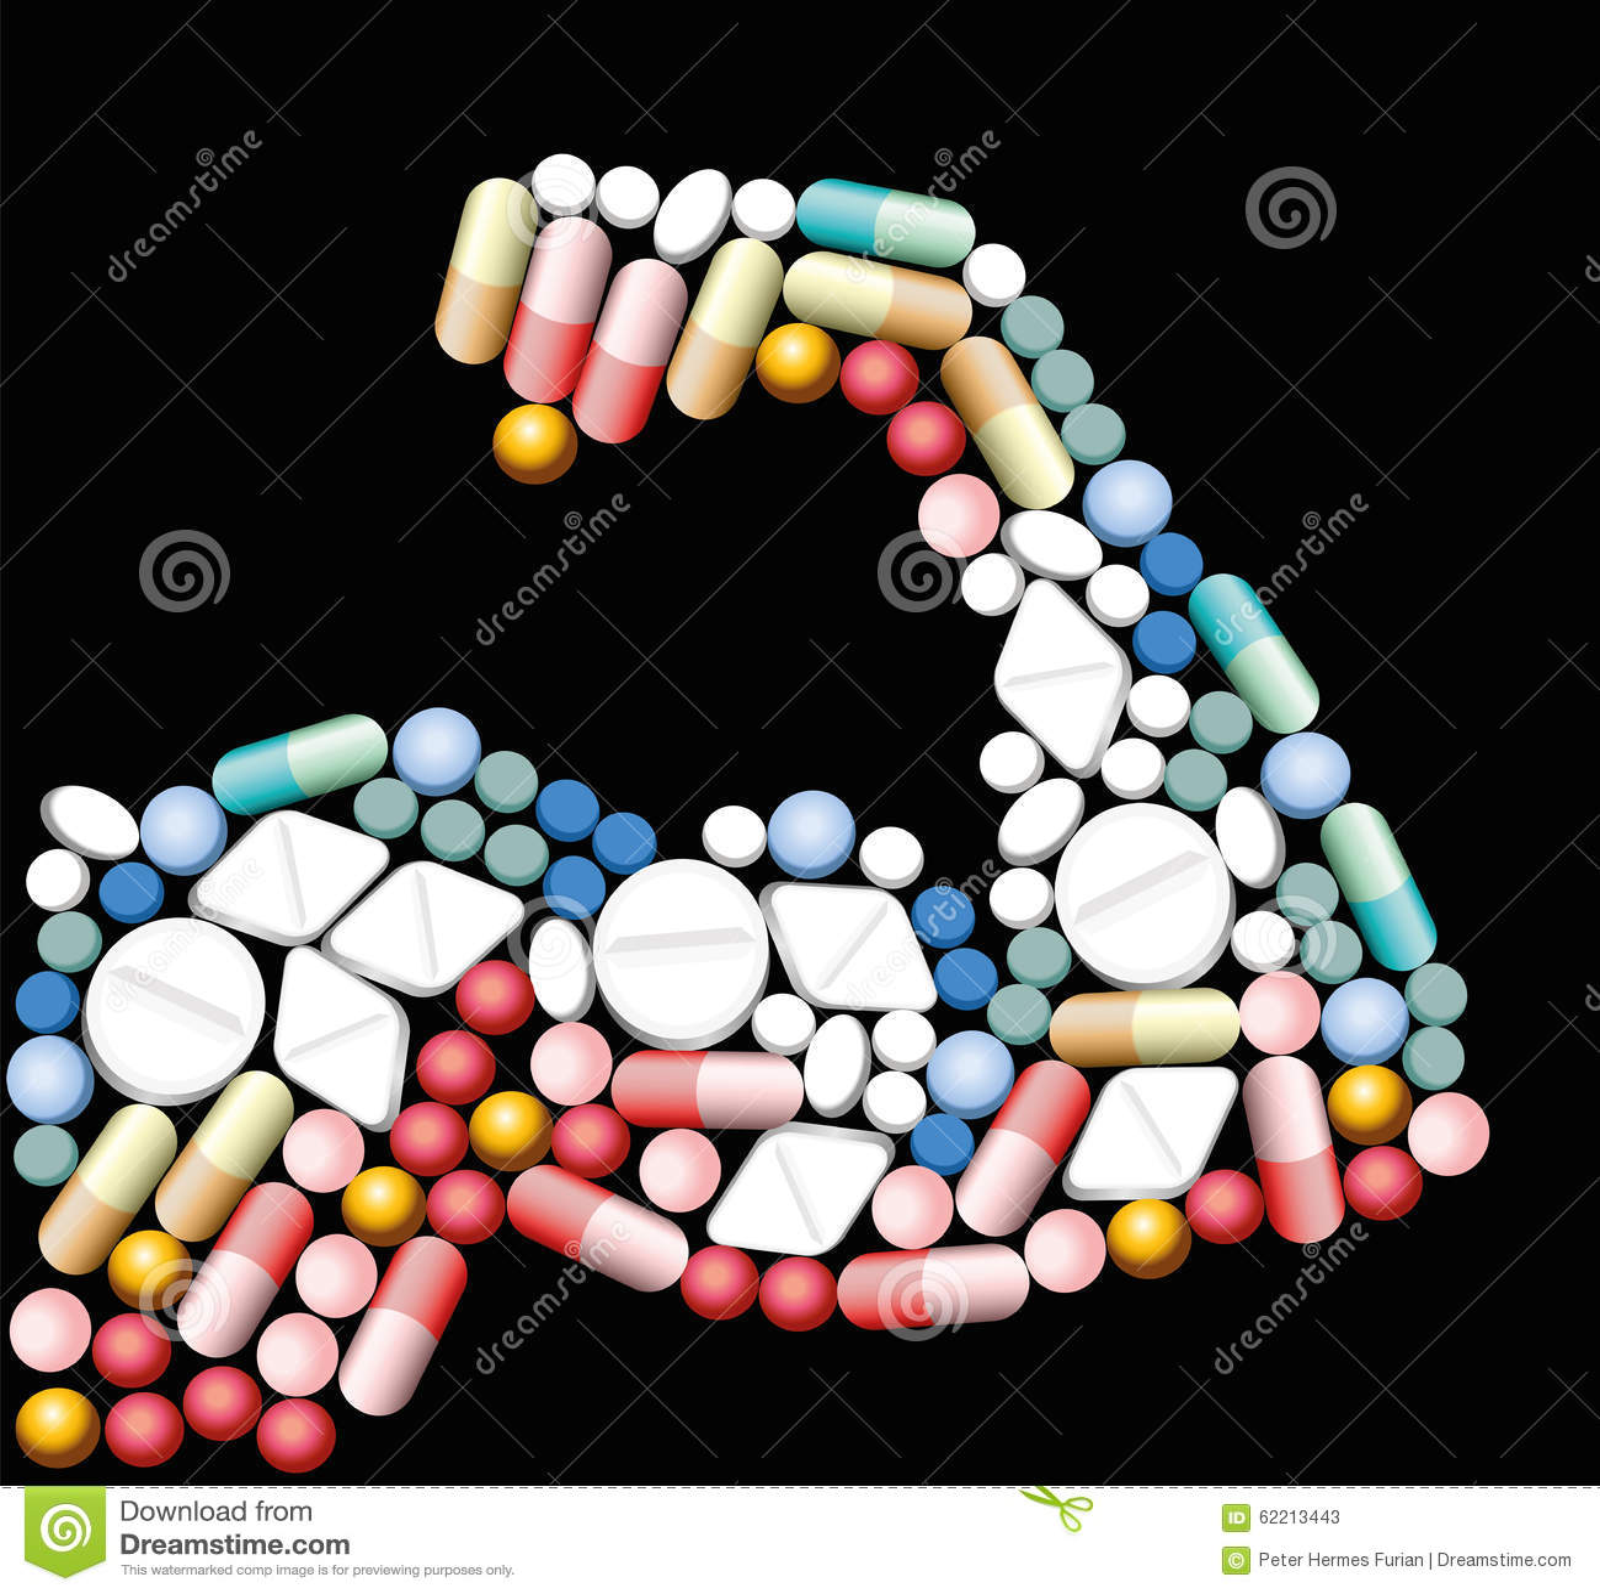 Anabolic Drugs Biceps Pills Stock Vector - Image: 62213443